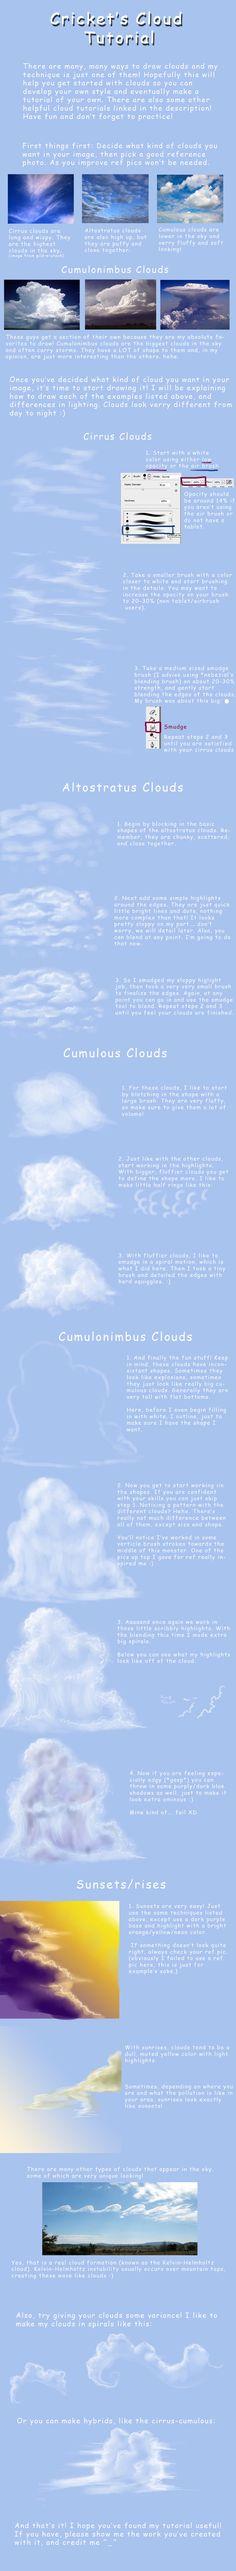 Cloud Tutorial by Crickatoo on DeviantArt